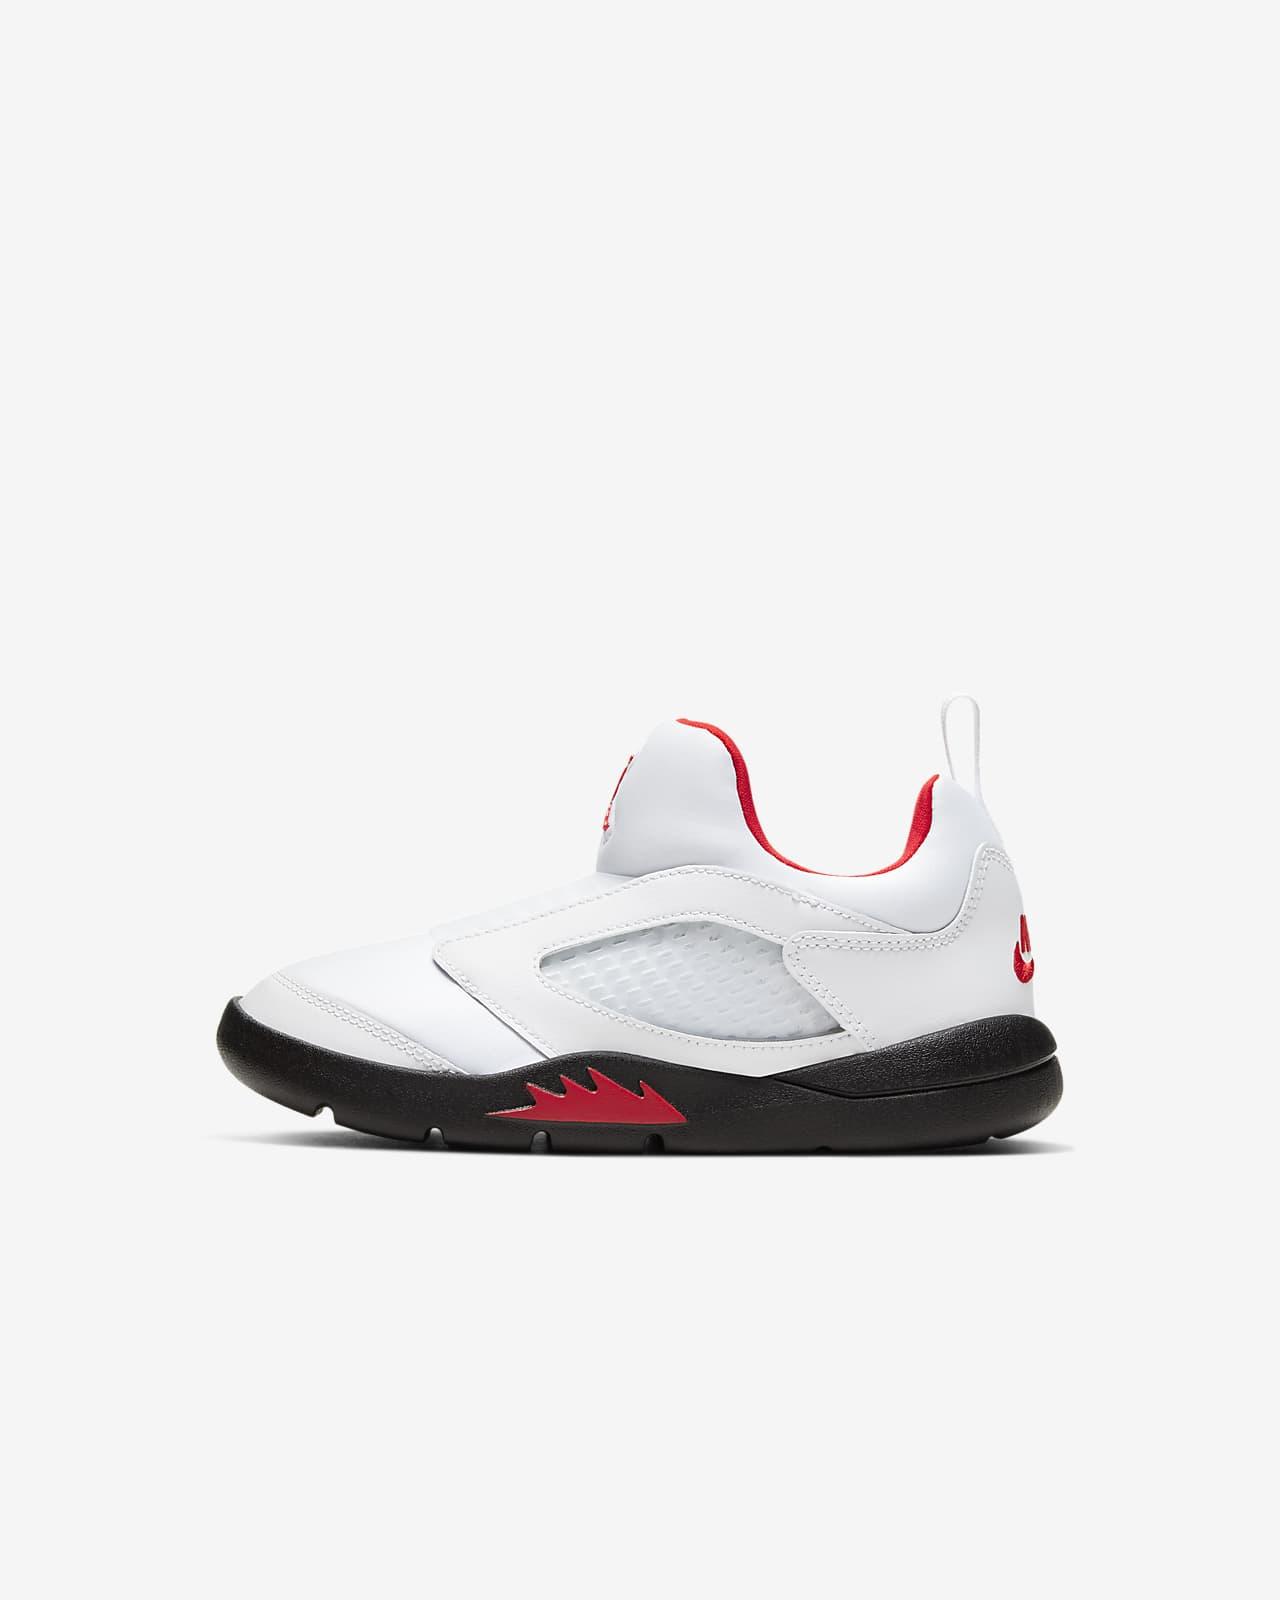 Jordan 5 Retro Little Flex Younger Kids' Shoe